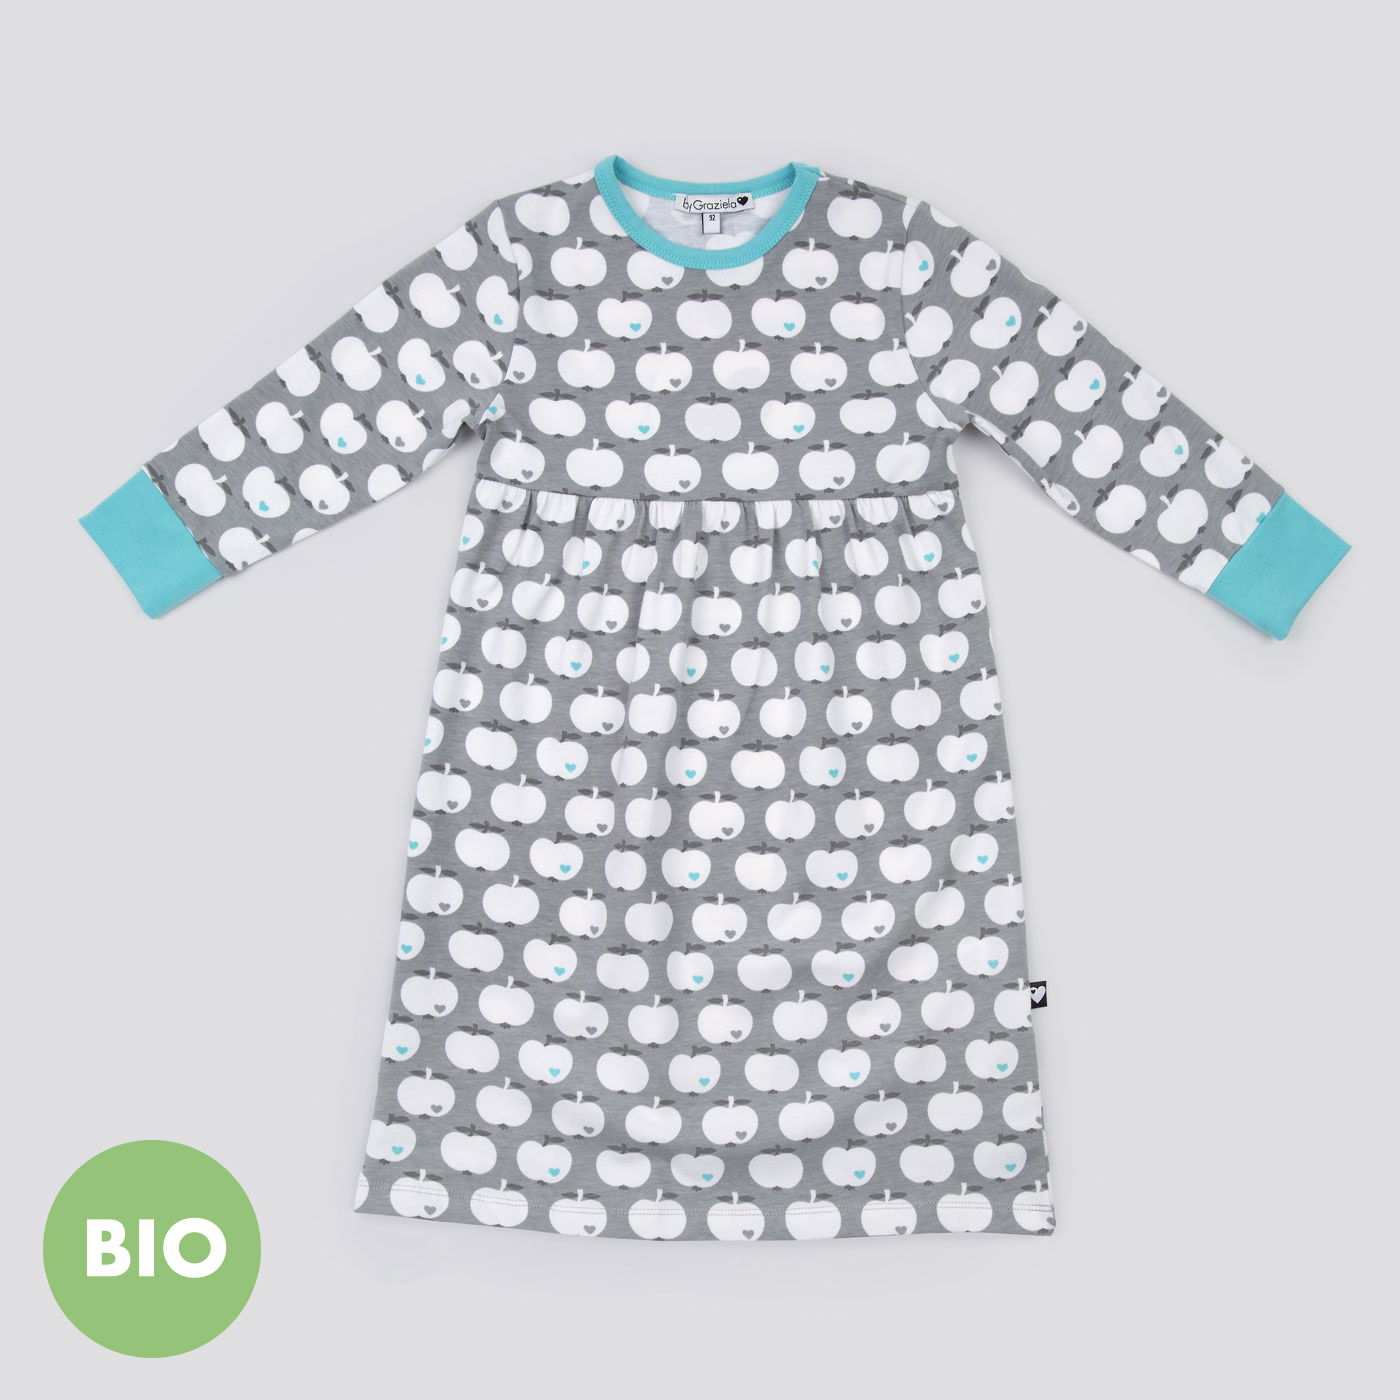 nachthemd apfel grau mint bis 30 euro f r kinder geschenke bygraziela. Black Bedroom Furniture Sets. Home Design Ideas